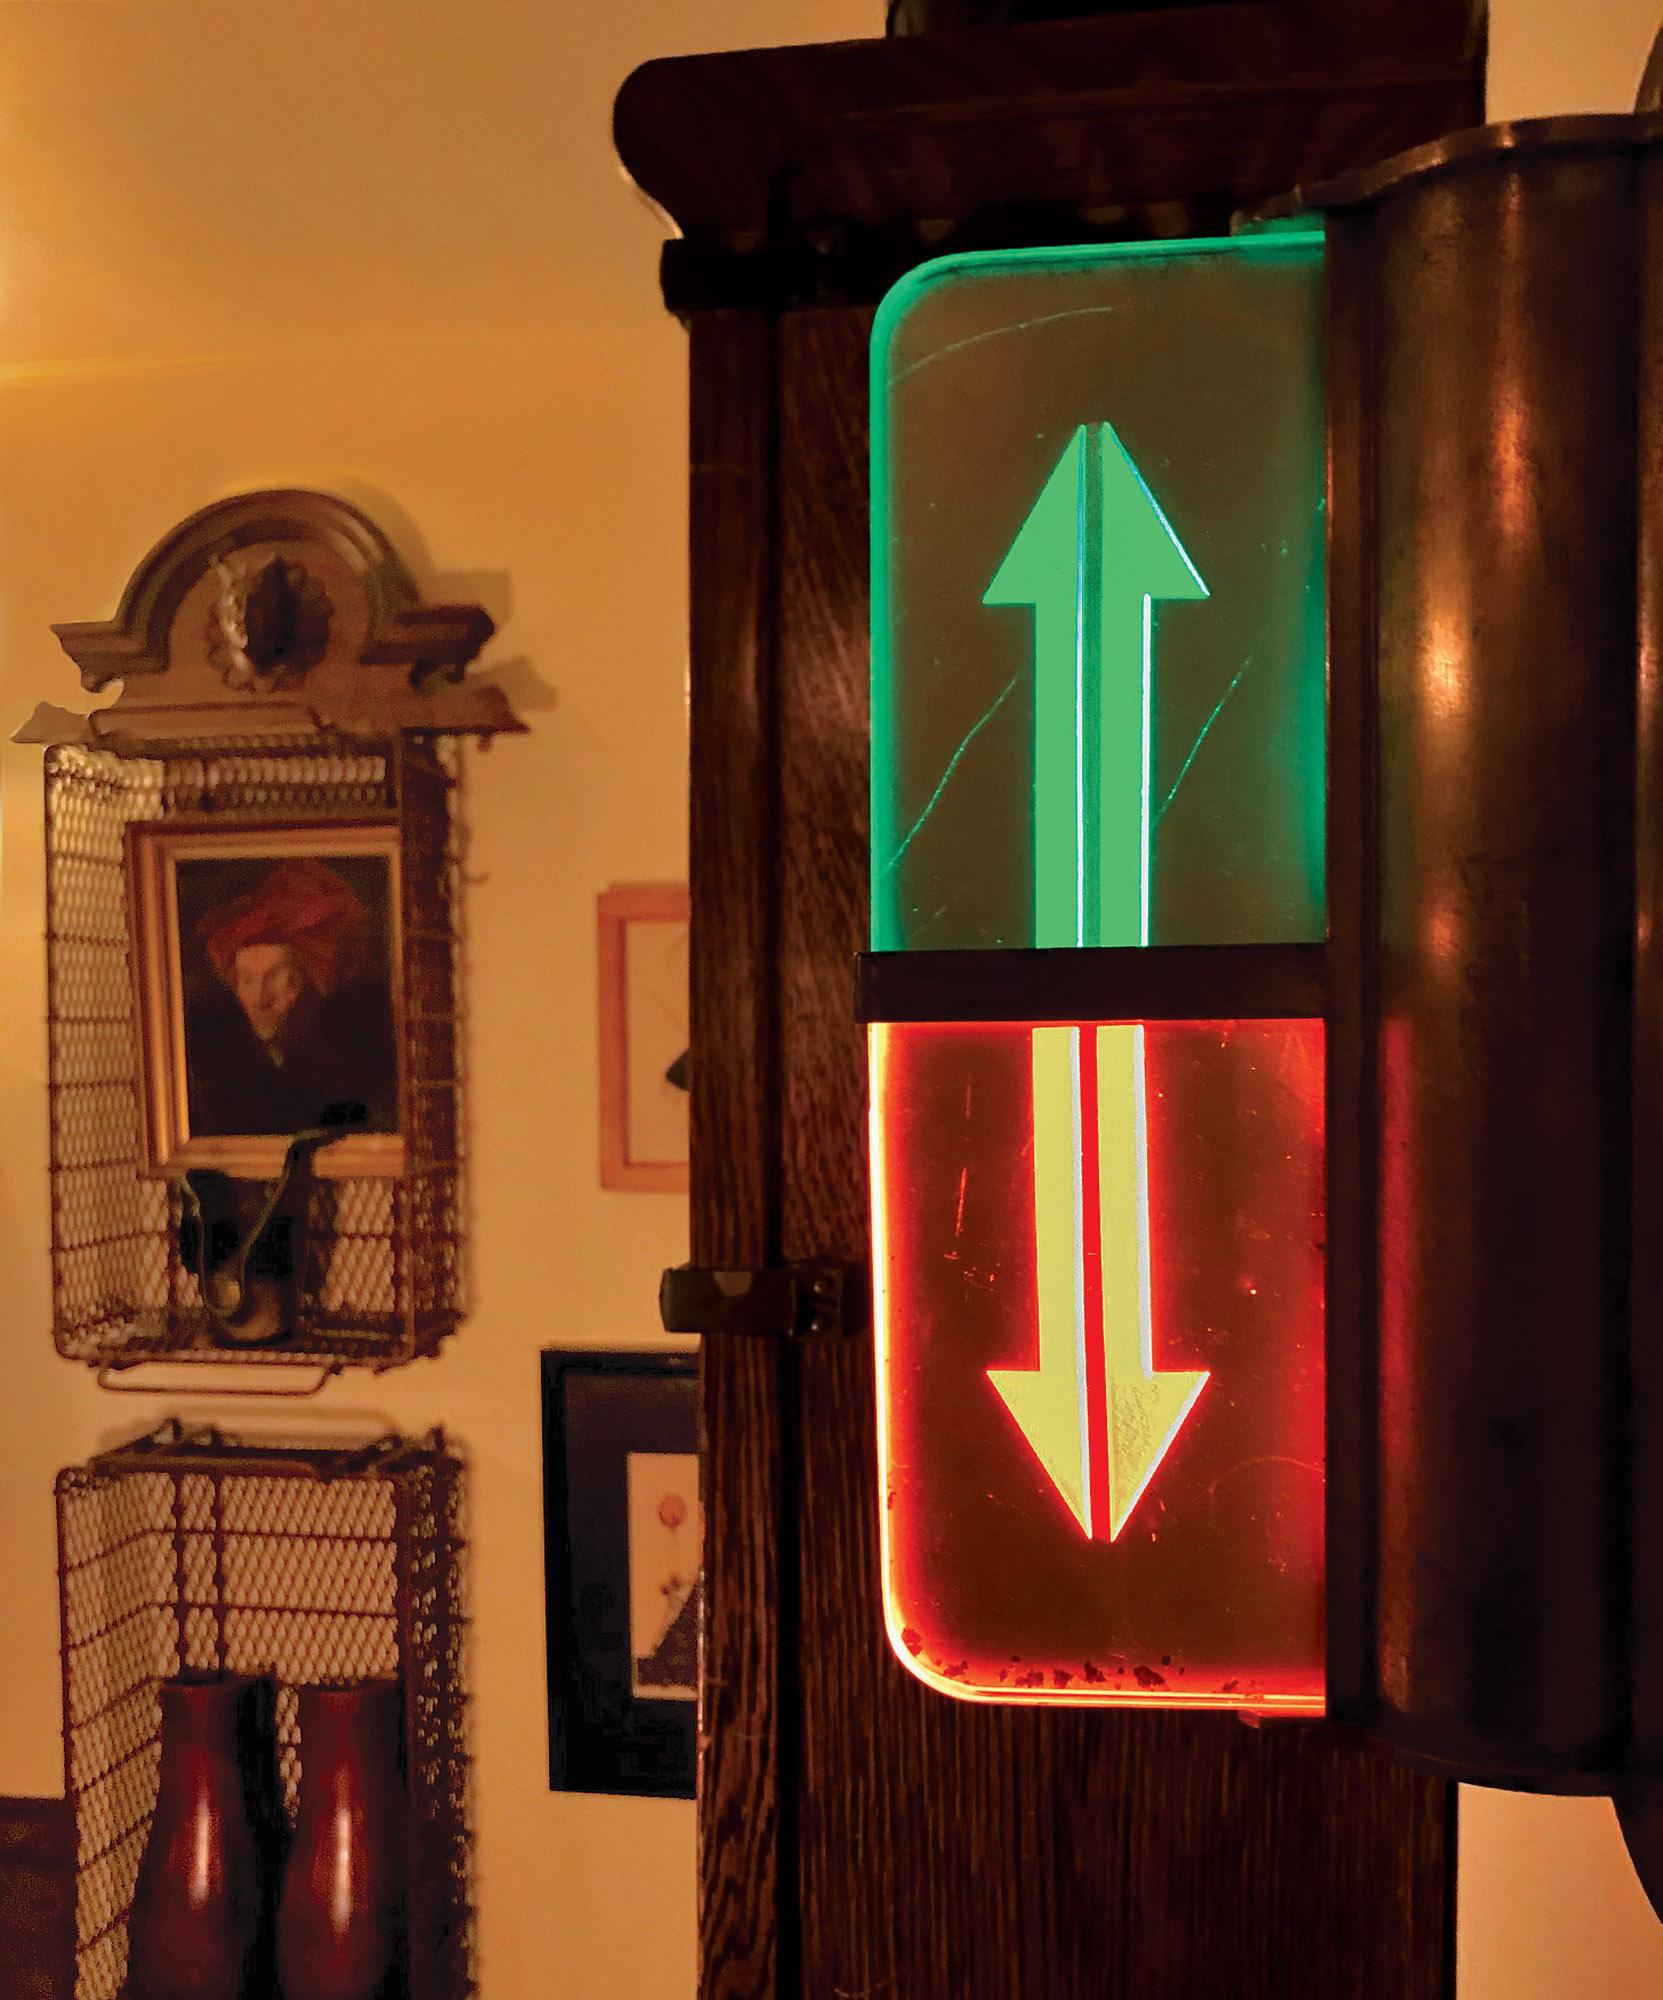 repurposed elevator indicator light